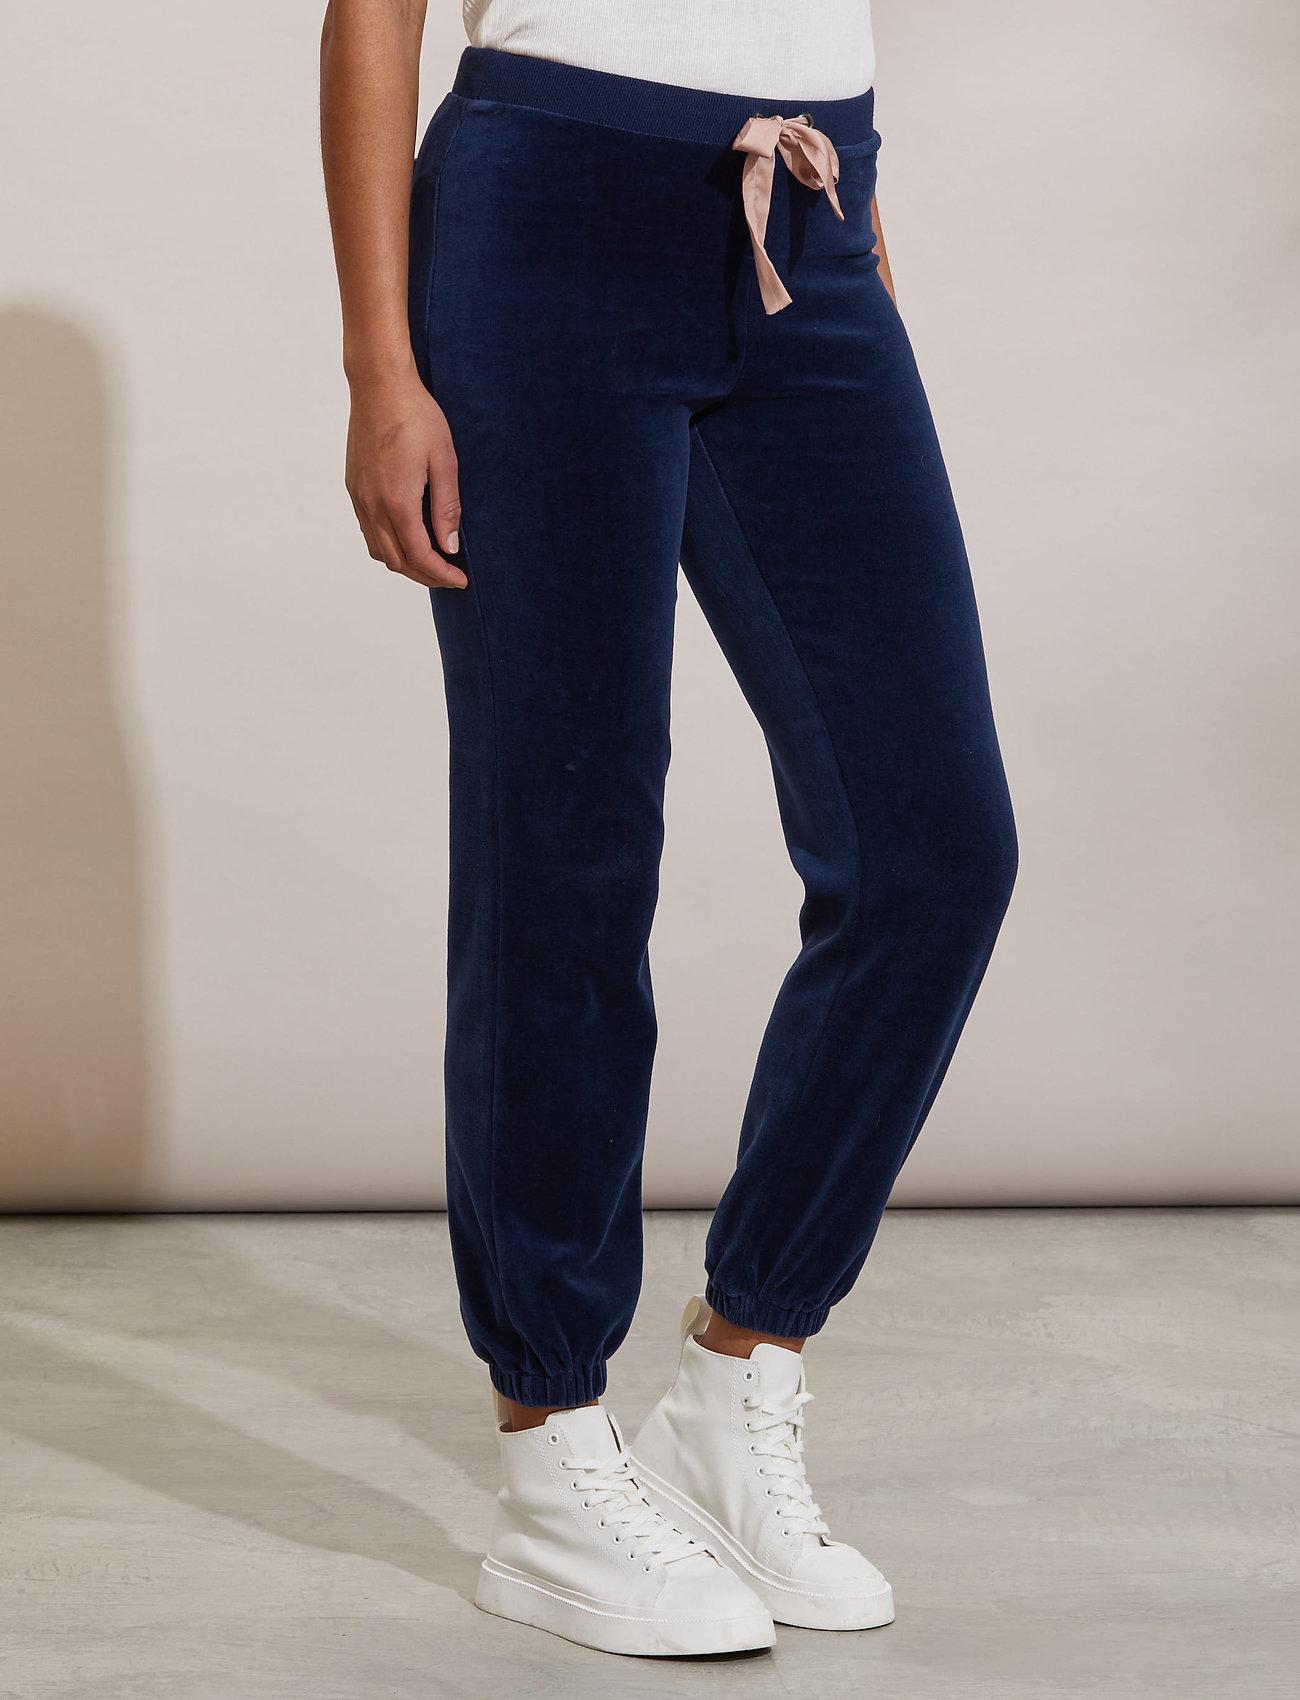 ODD MOLLY - Helena Pants - sweatpants - dark blue - 0